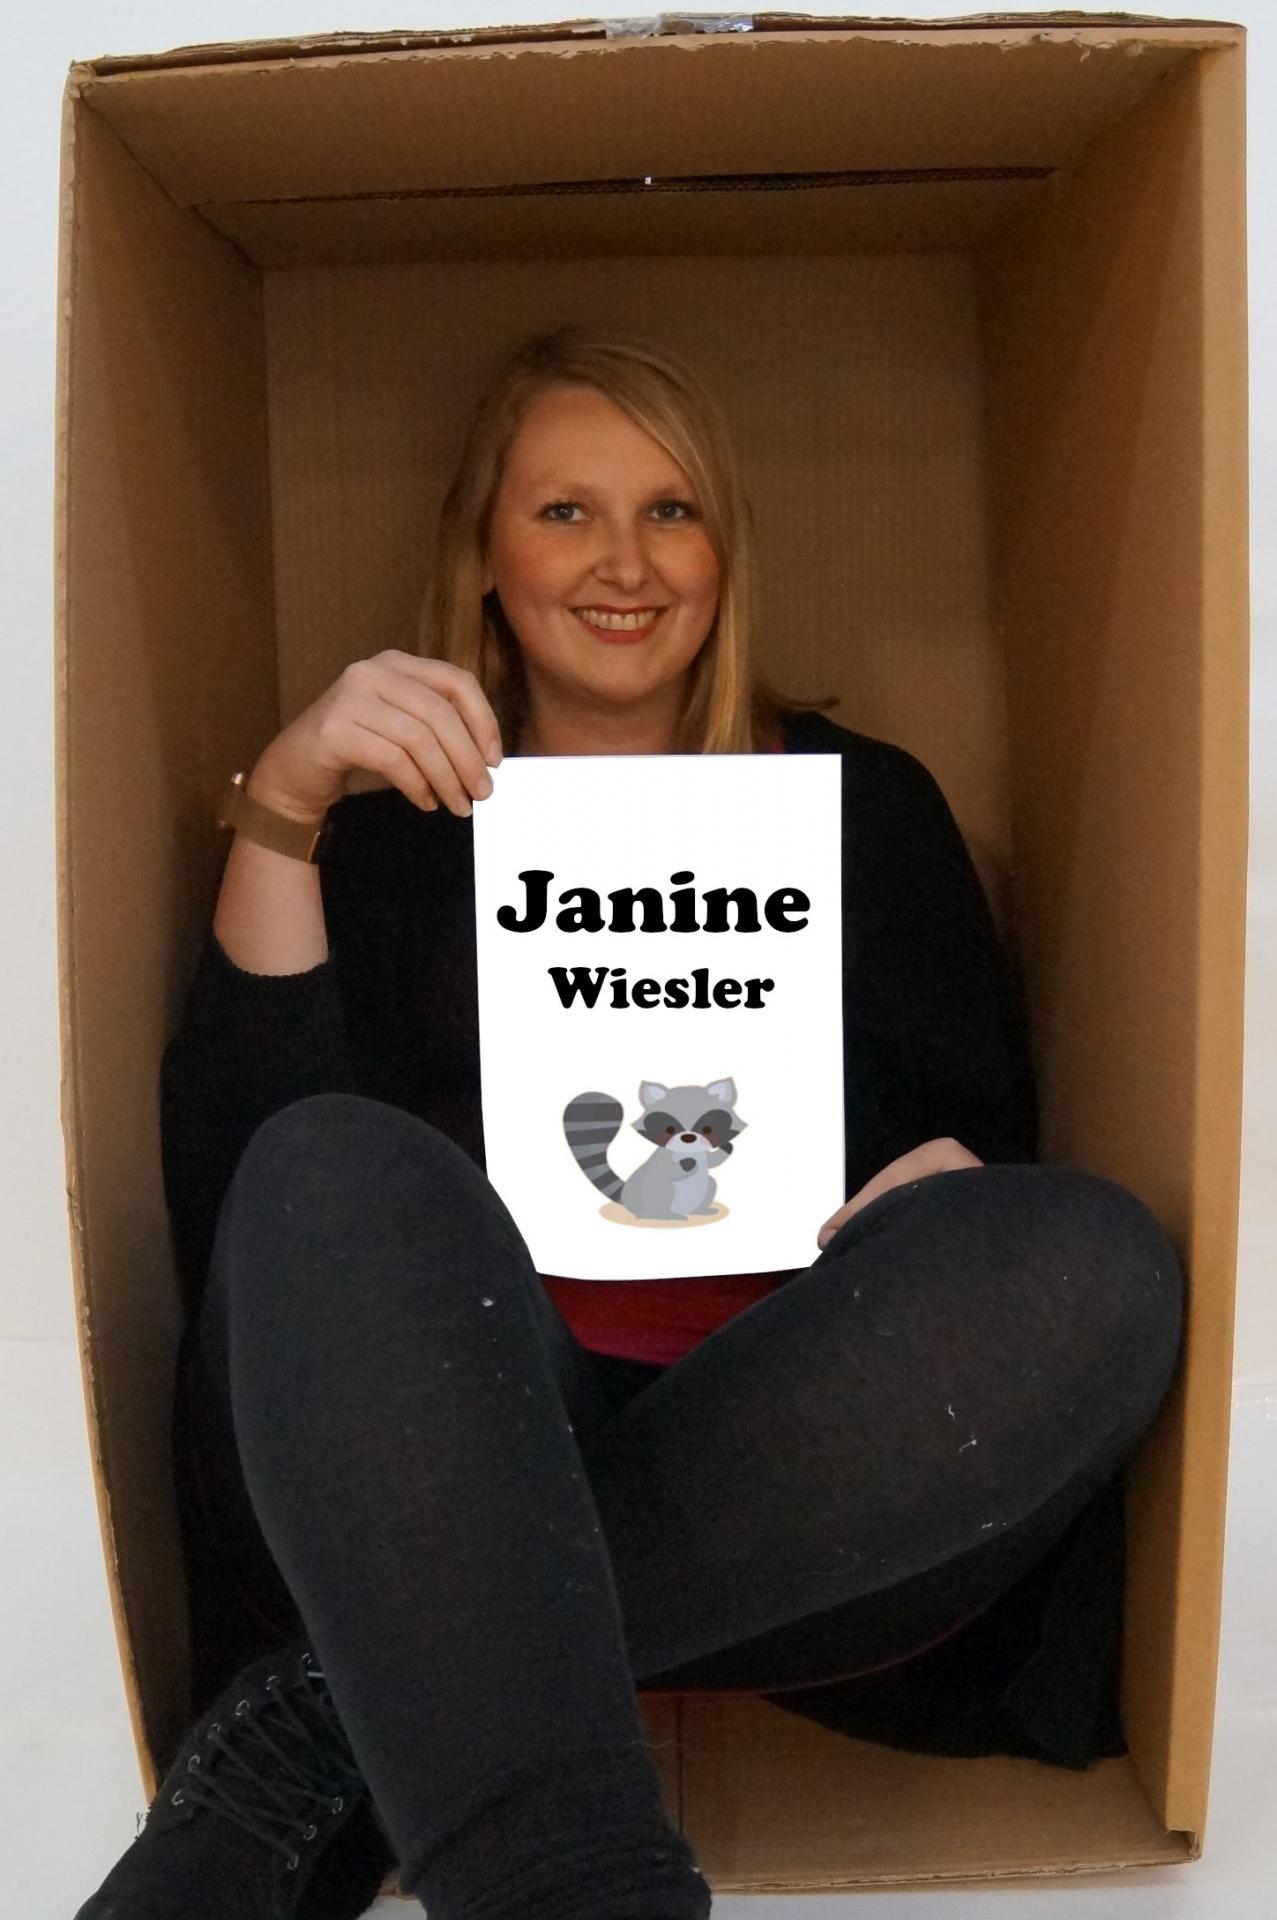 Janine Wiesler